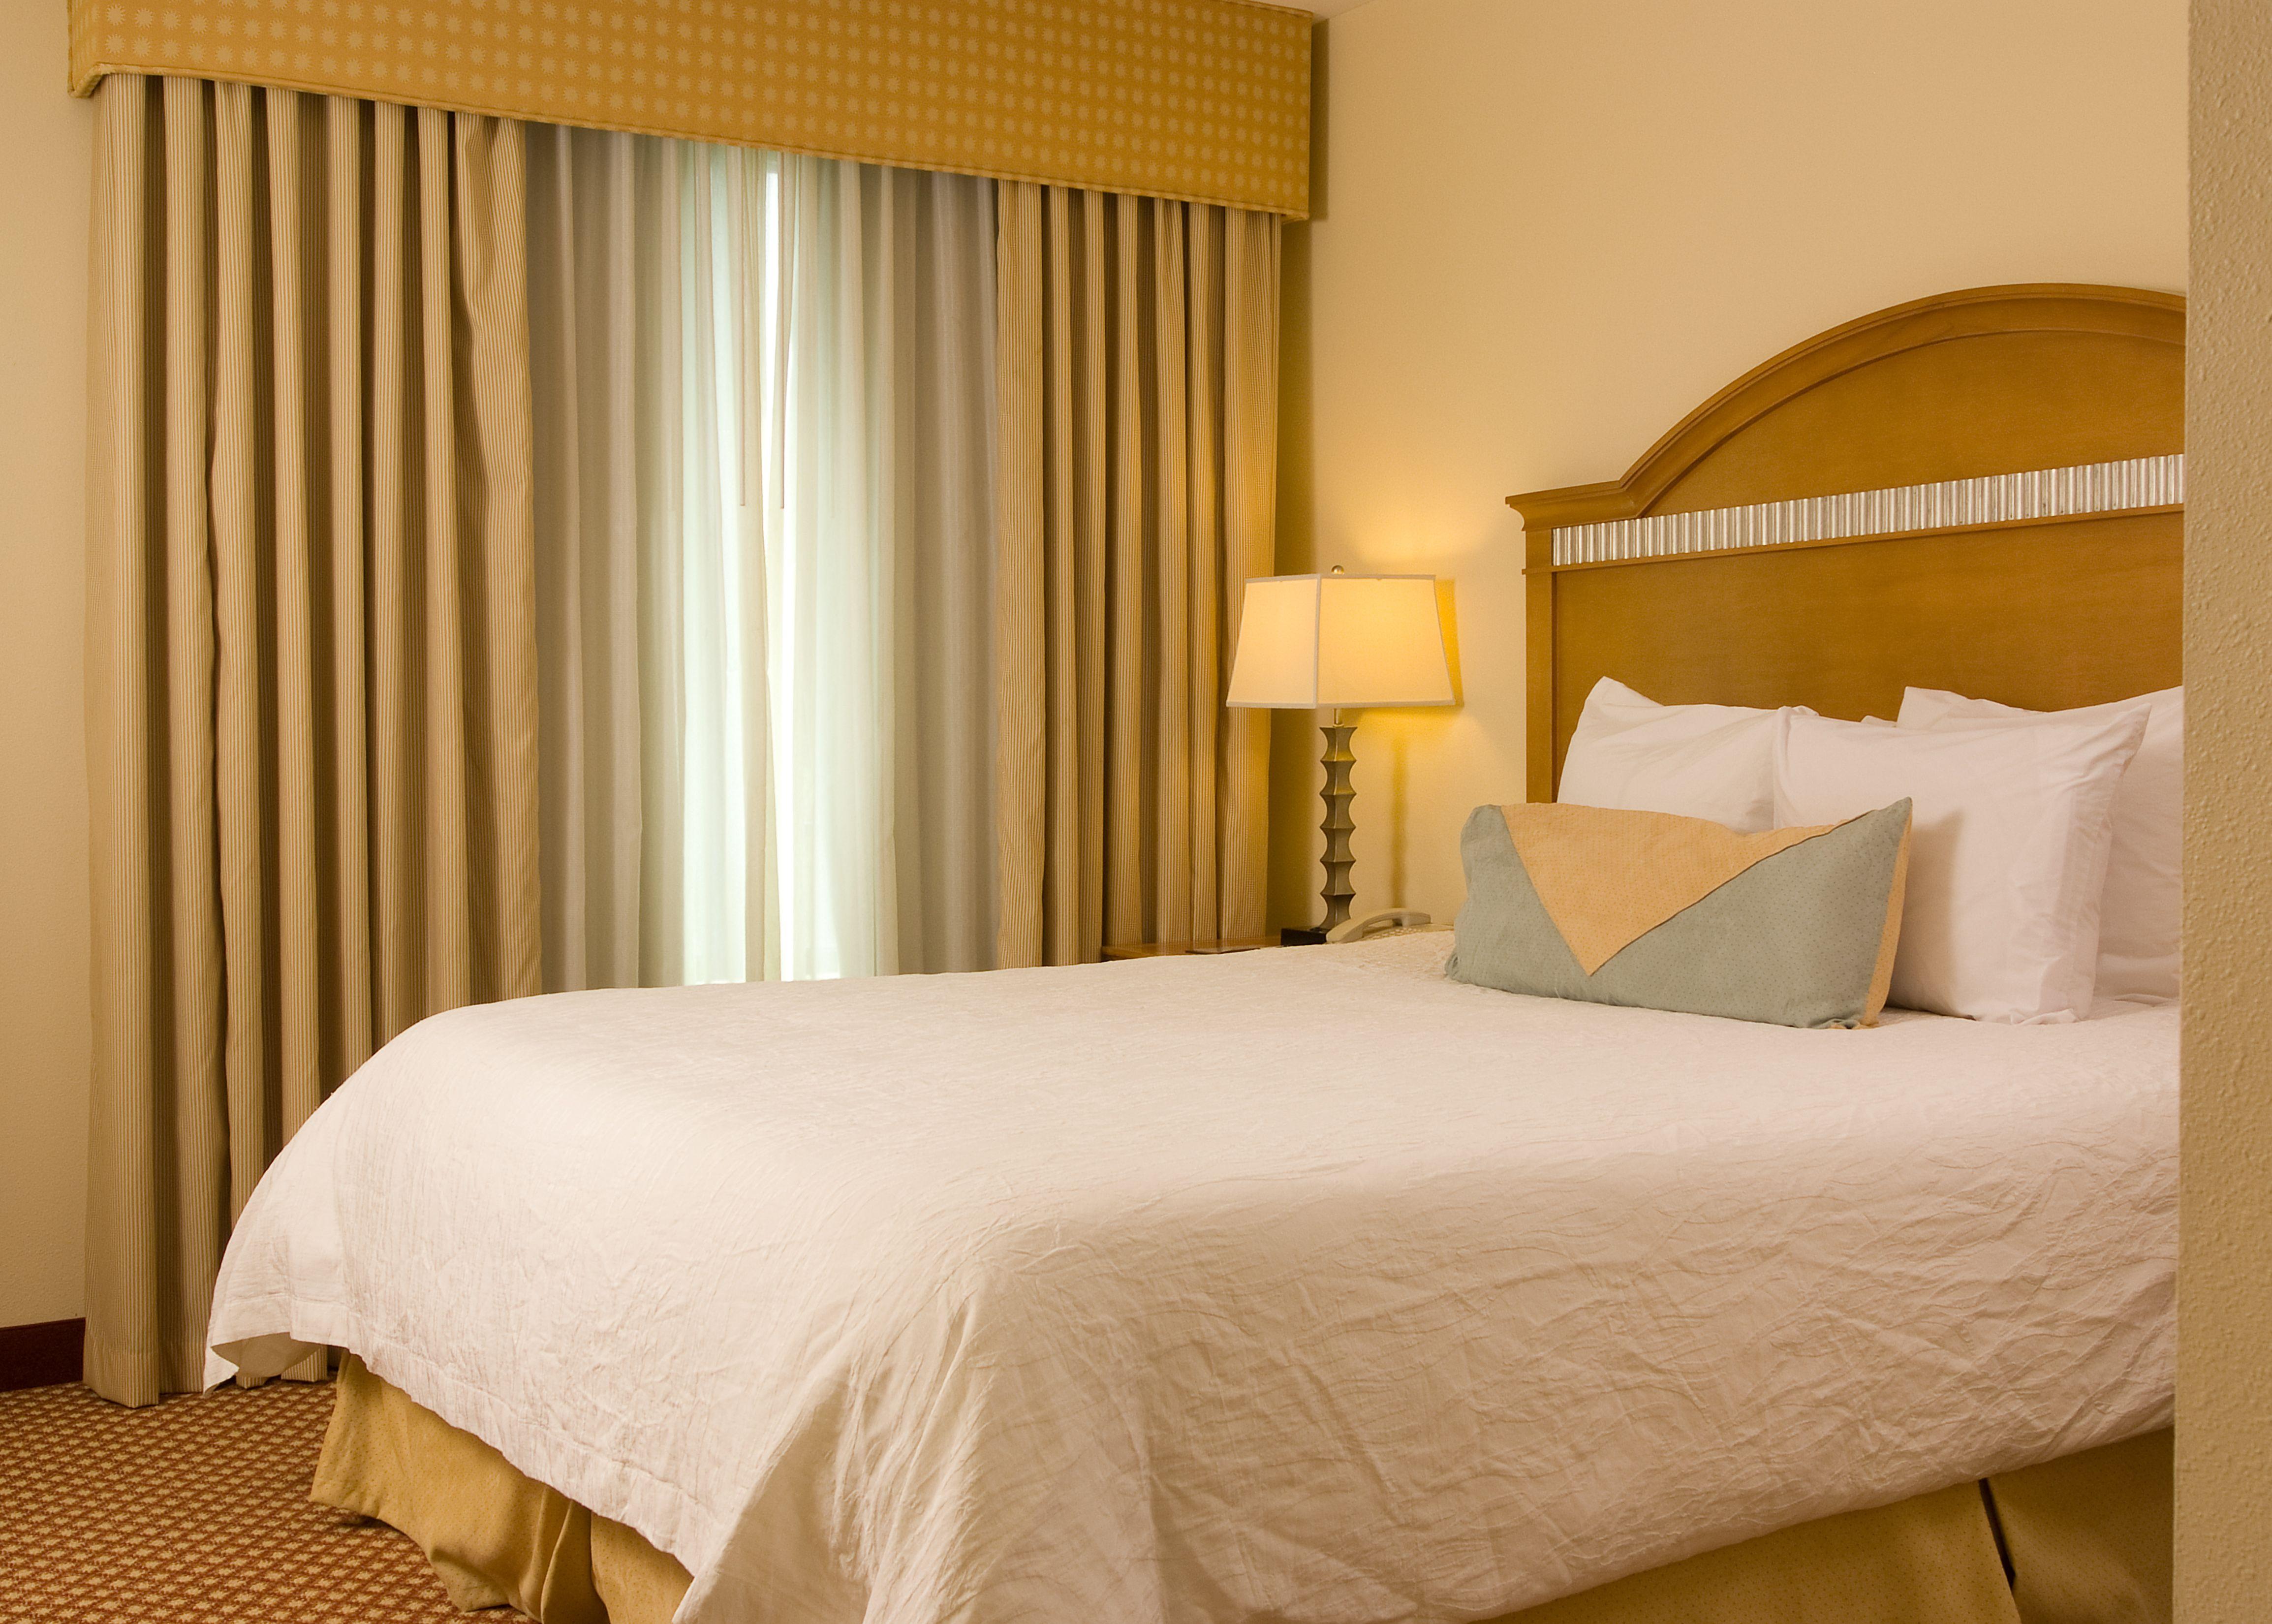 Hilton Garden Inn Atlanta Airport-King Suite http://hiltongardeninn3 ...